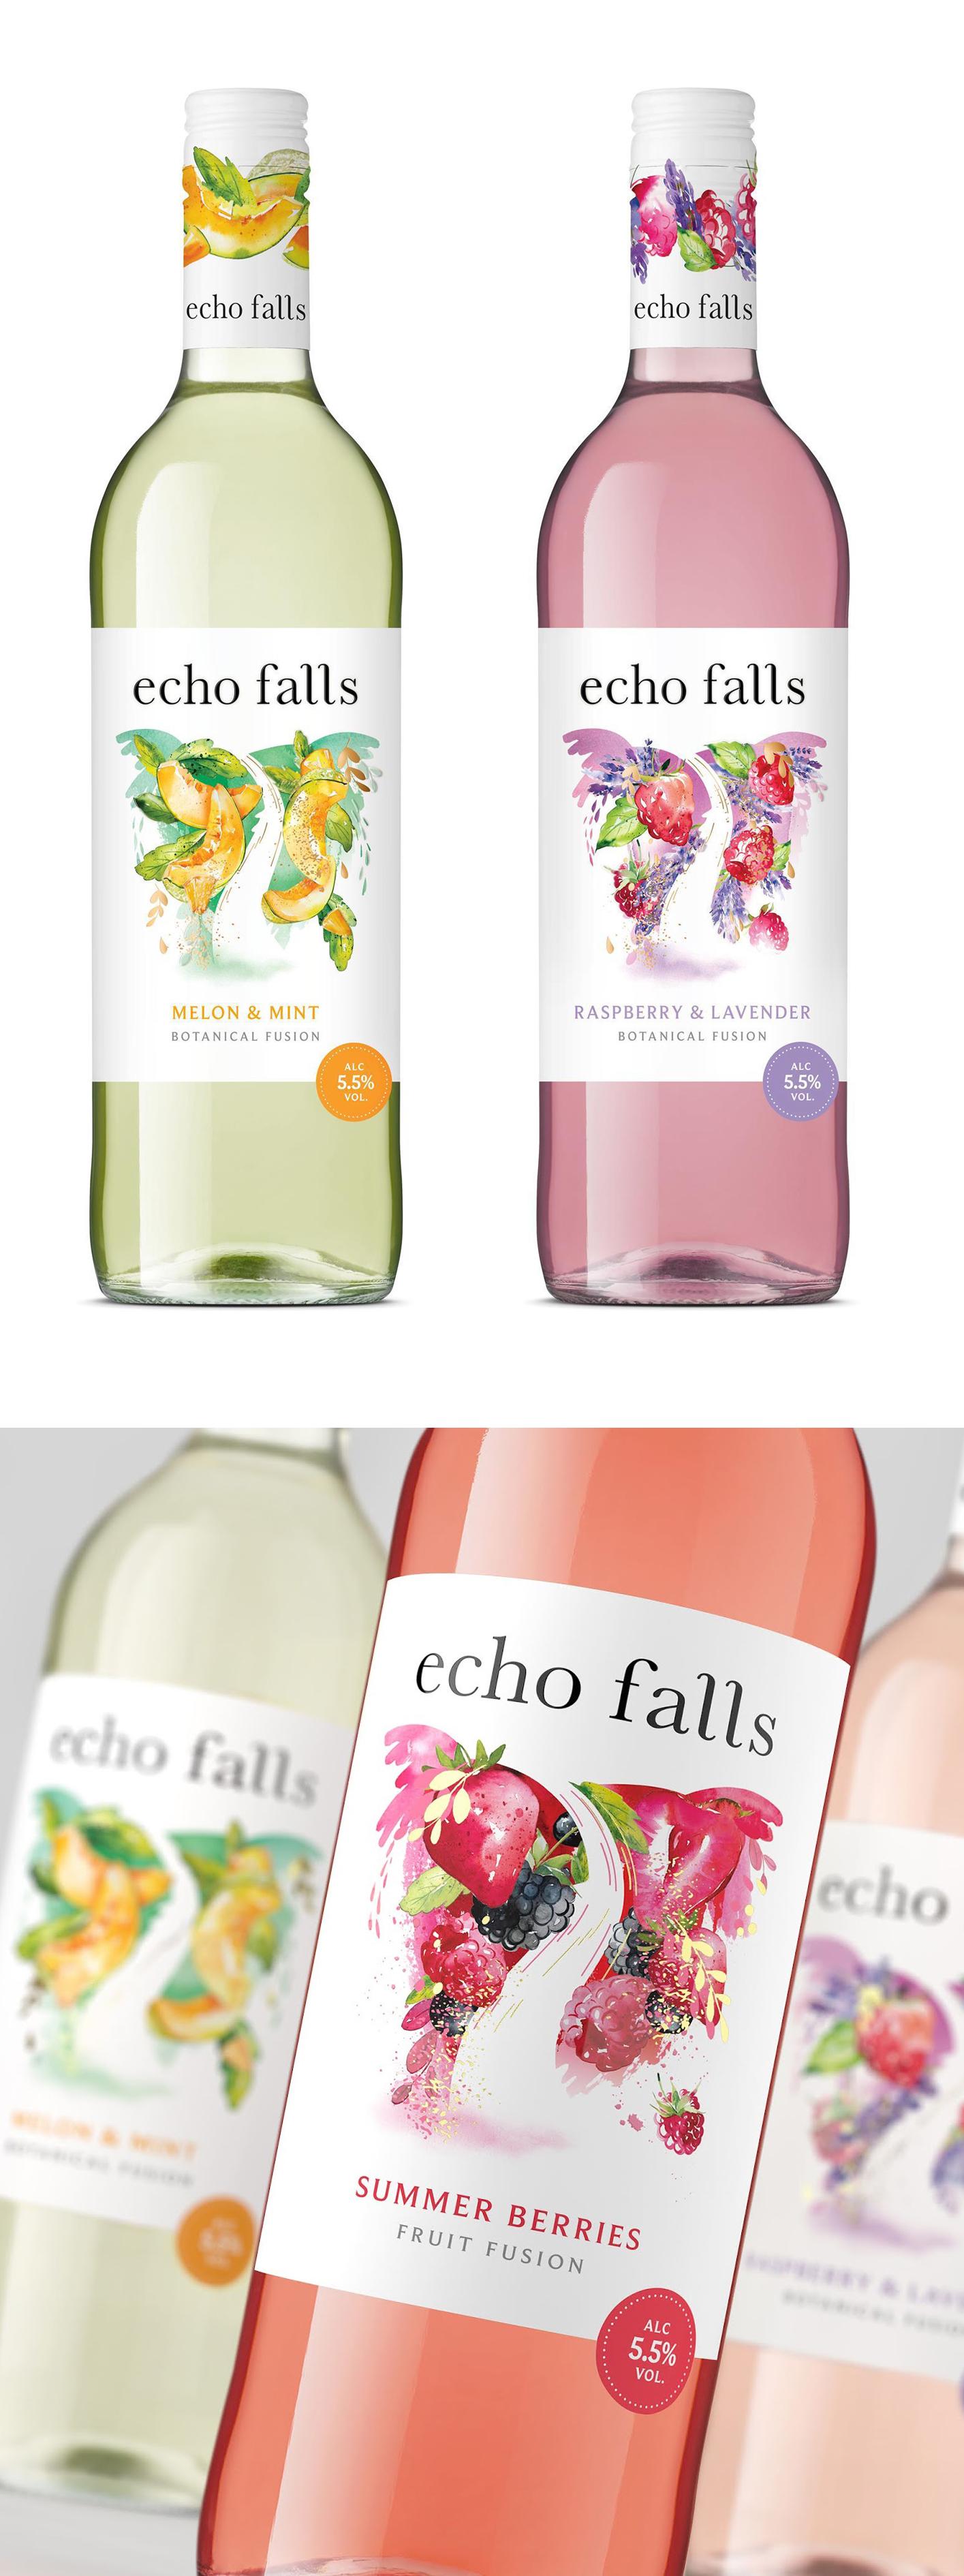 Echo Falls botanical Fusion